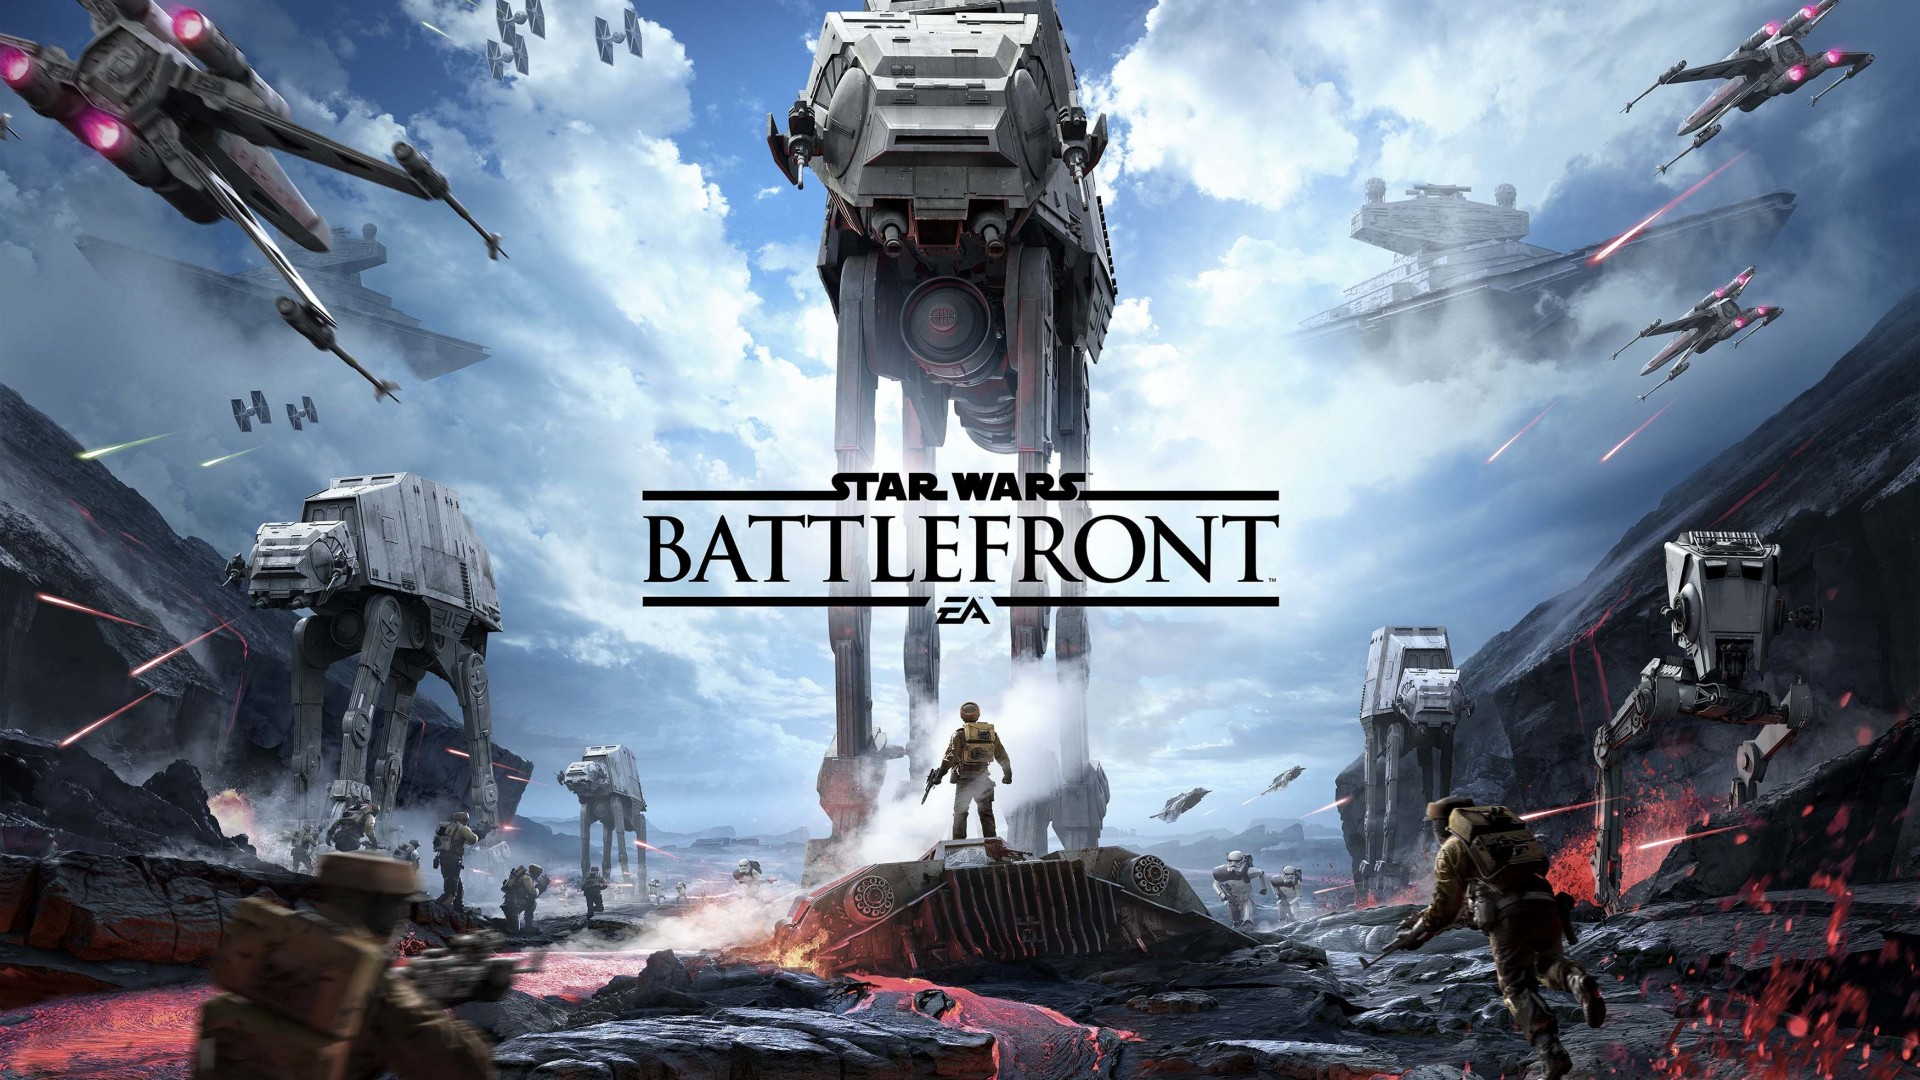 STAR WARS Battlefront | Гарантия | + Подарок +Бонус